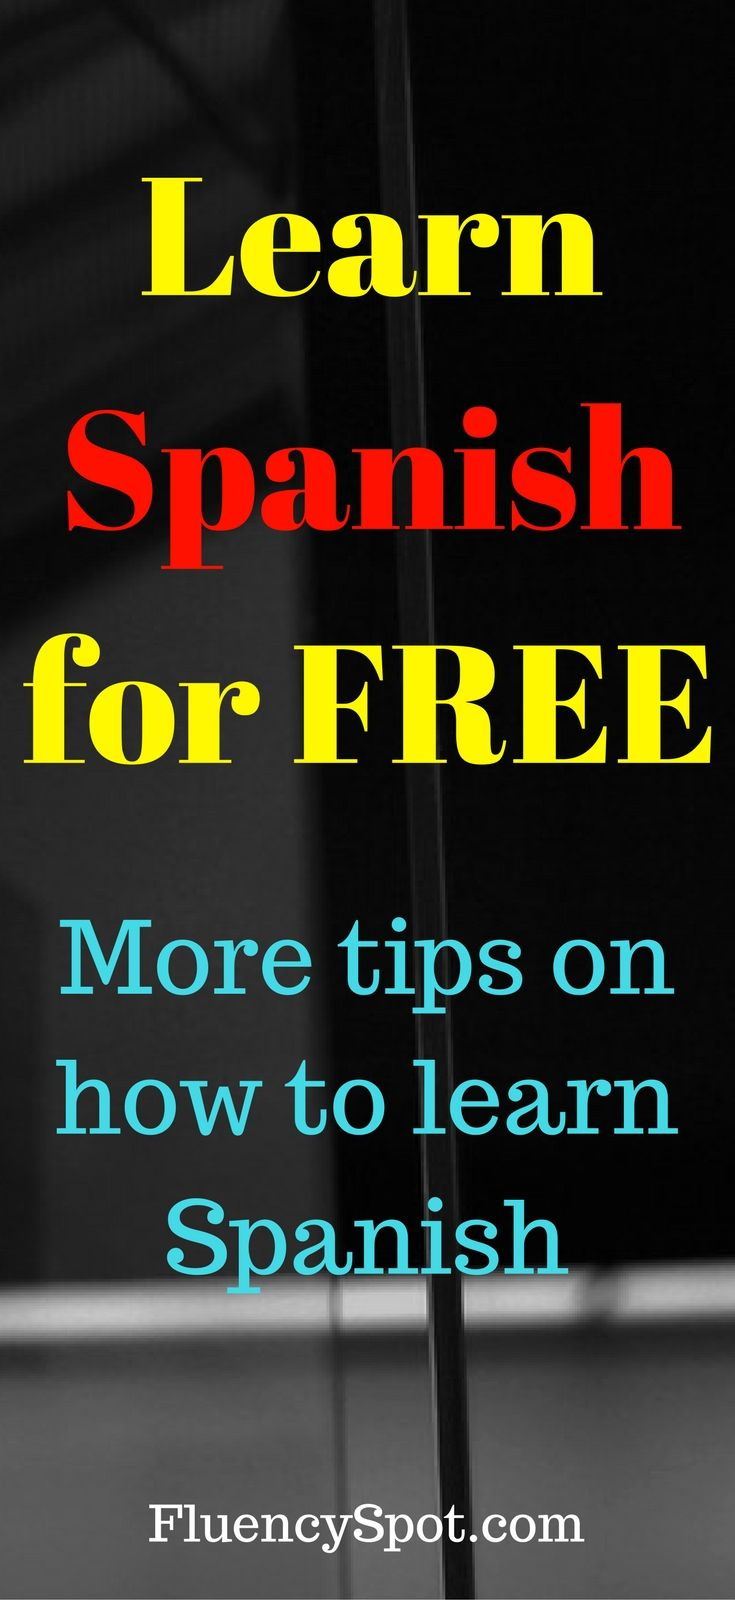 Cuban Spanish 101: Regional Twists, Accents and 23 Slang ...